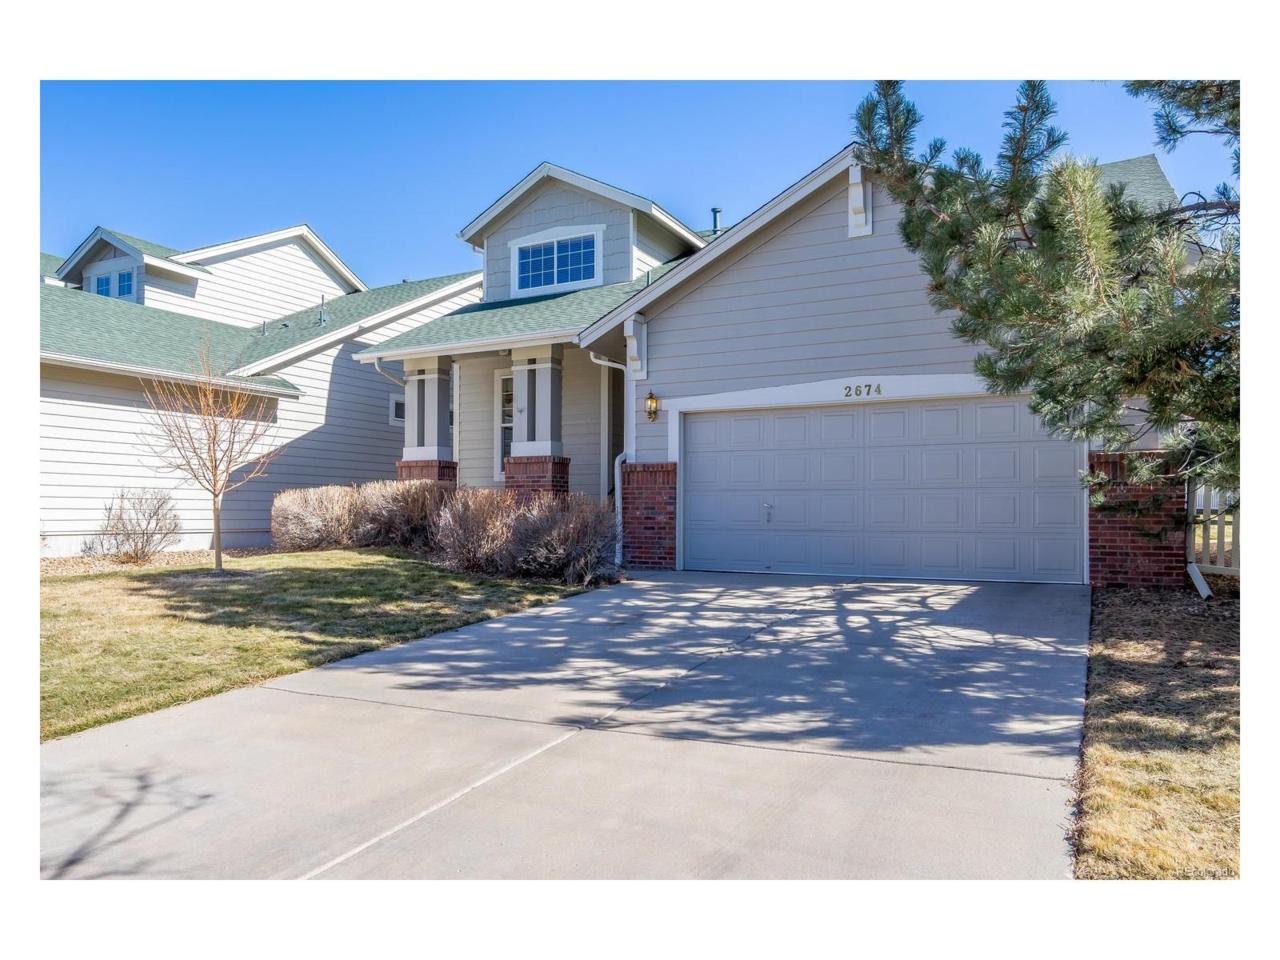 2674 S Troy Court, Aurora, CO 80014 (MLS #8706254) :: 8z Real Estate